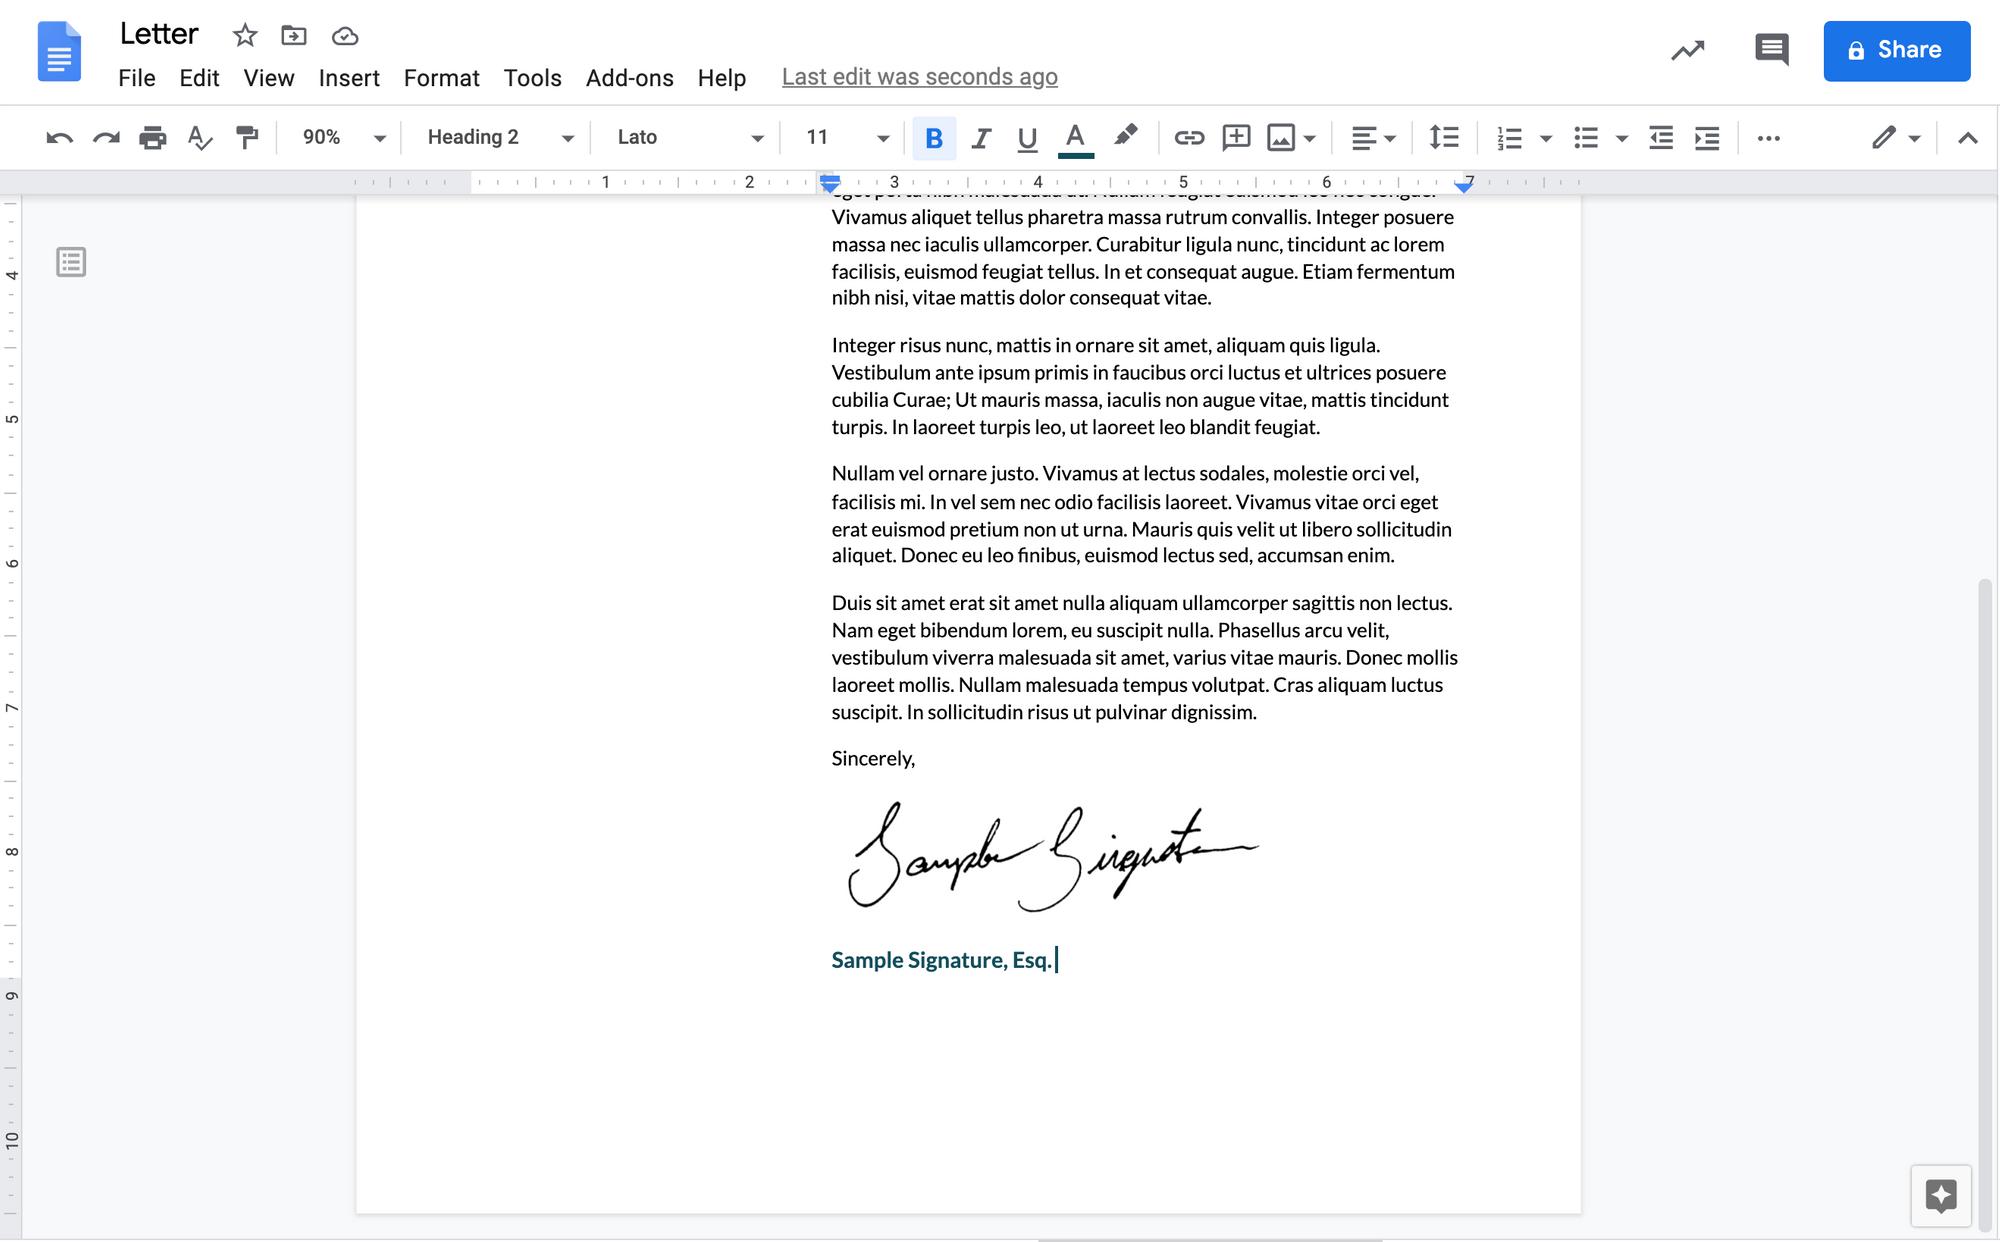 A screenshot of a transparent signature added to a Google Doc.